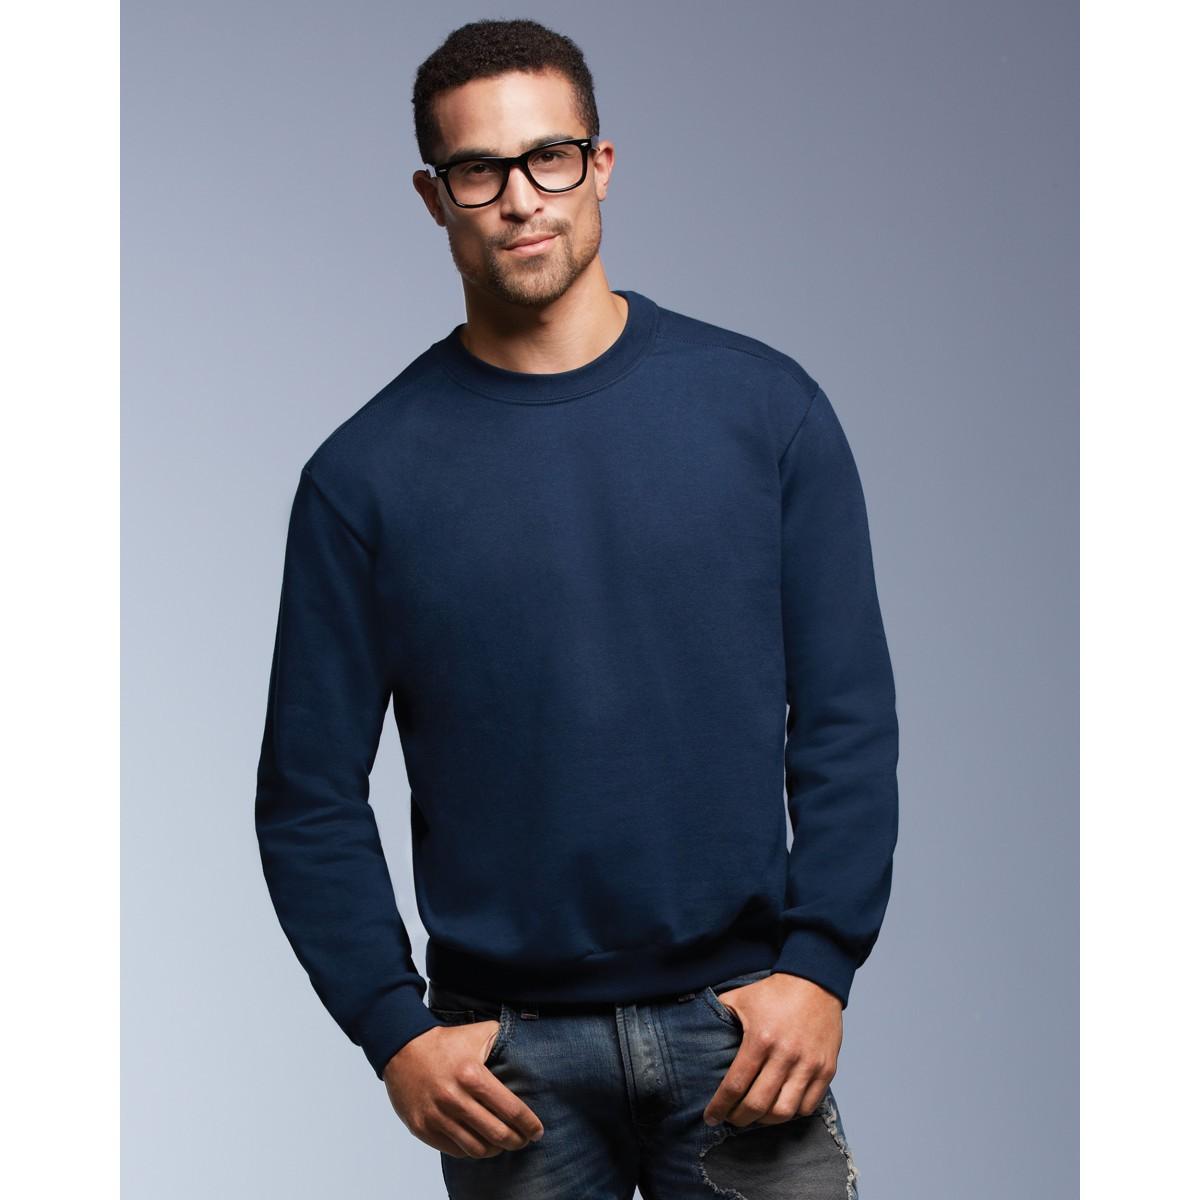 Personalised Jumpers and Printed Sweatshirts - Printsome 4056079ad